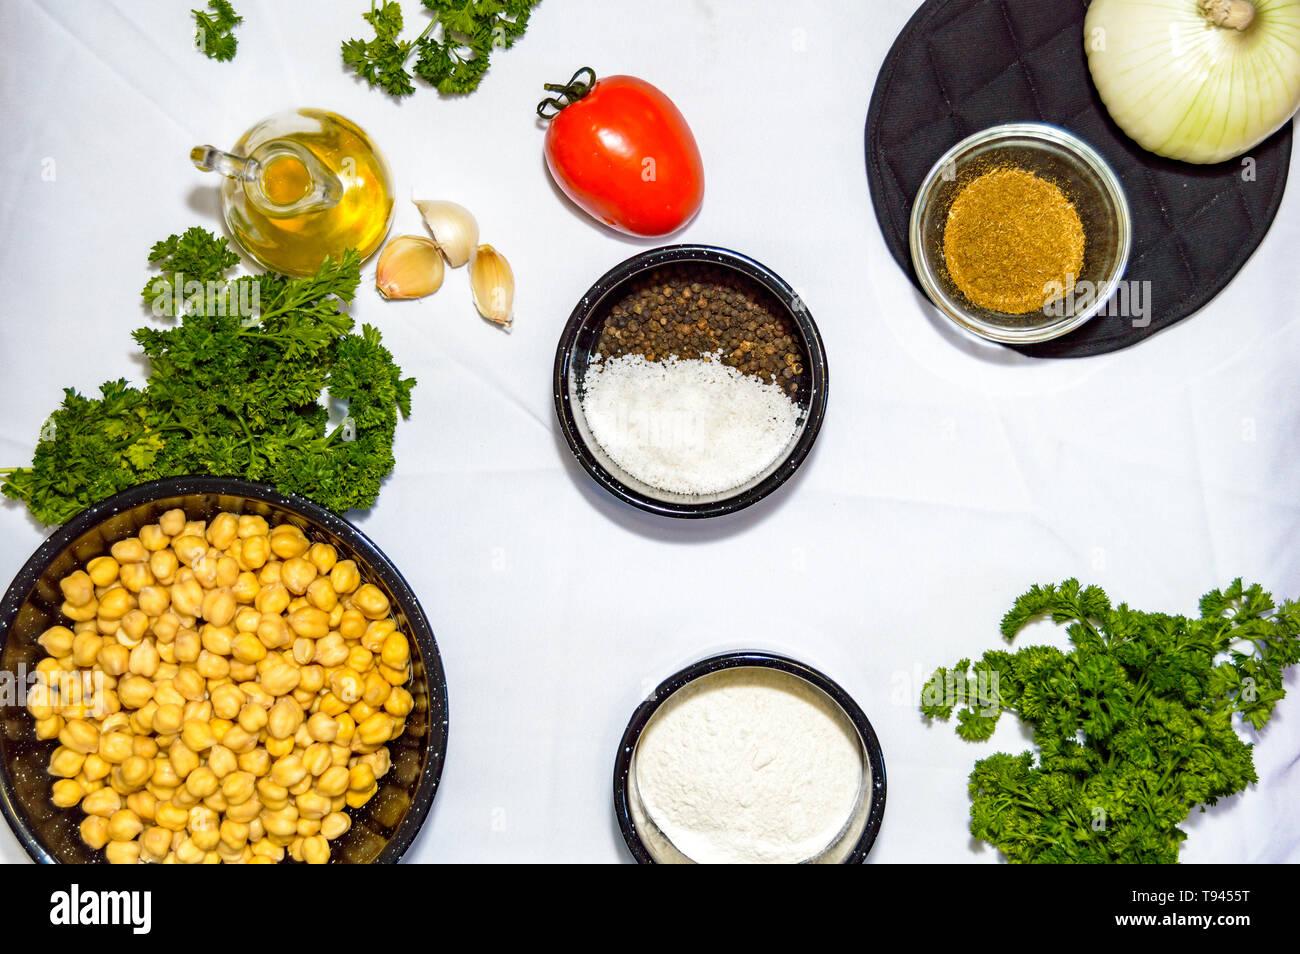 Arabic Menu Stock Photos & Arabic Menu Stock Images - Alamy